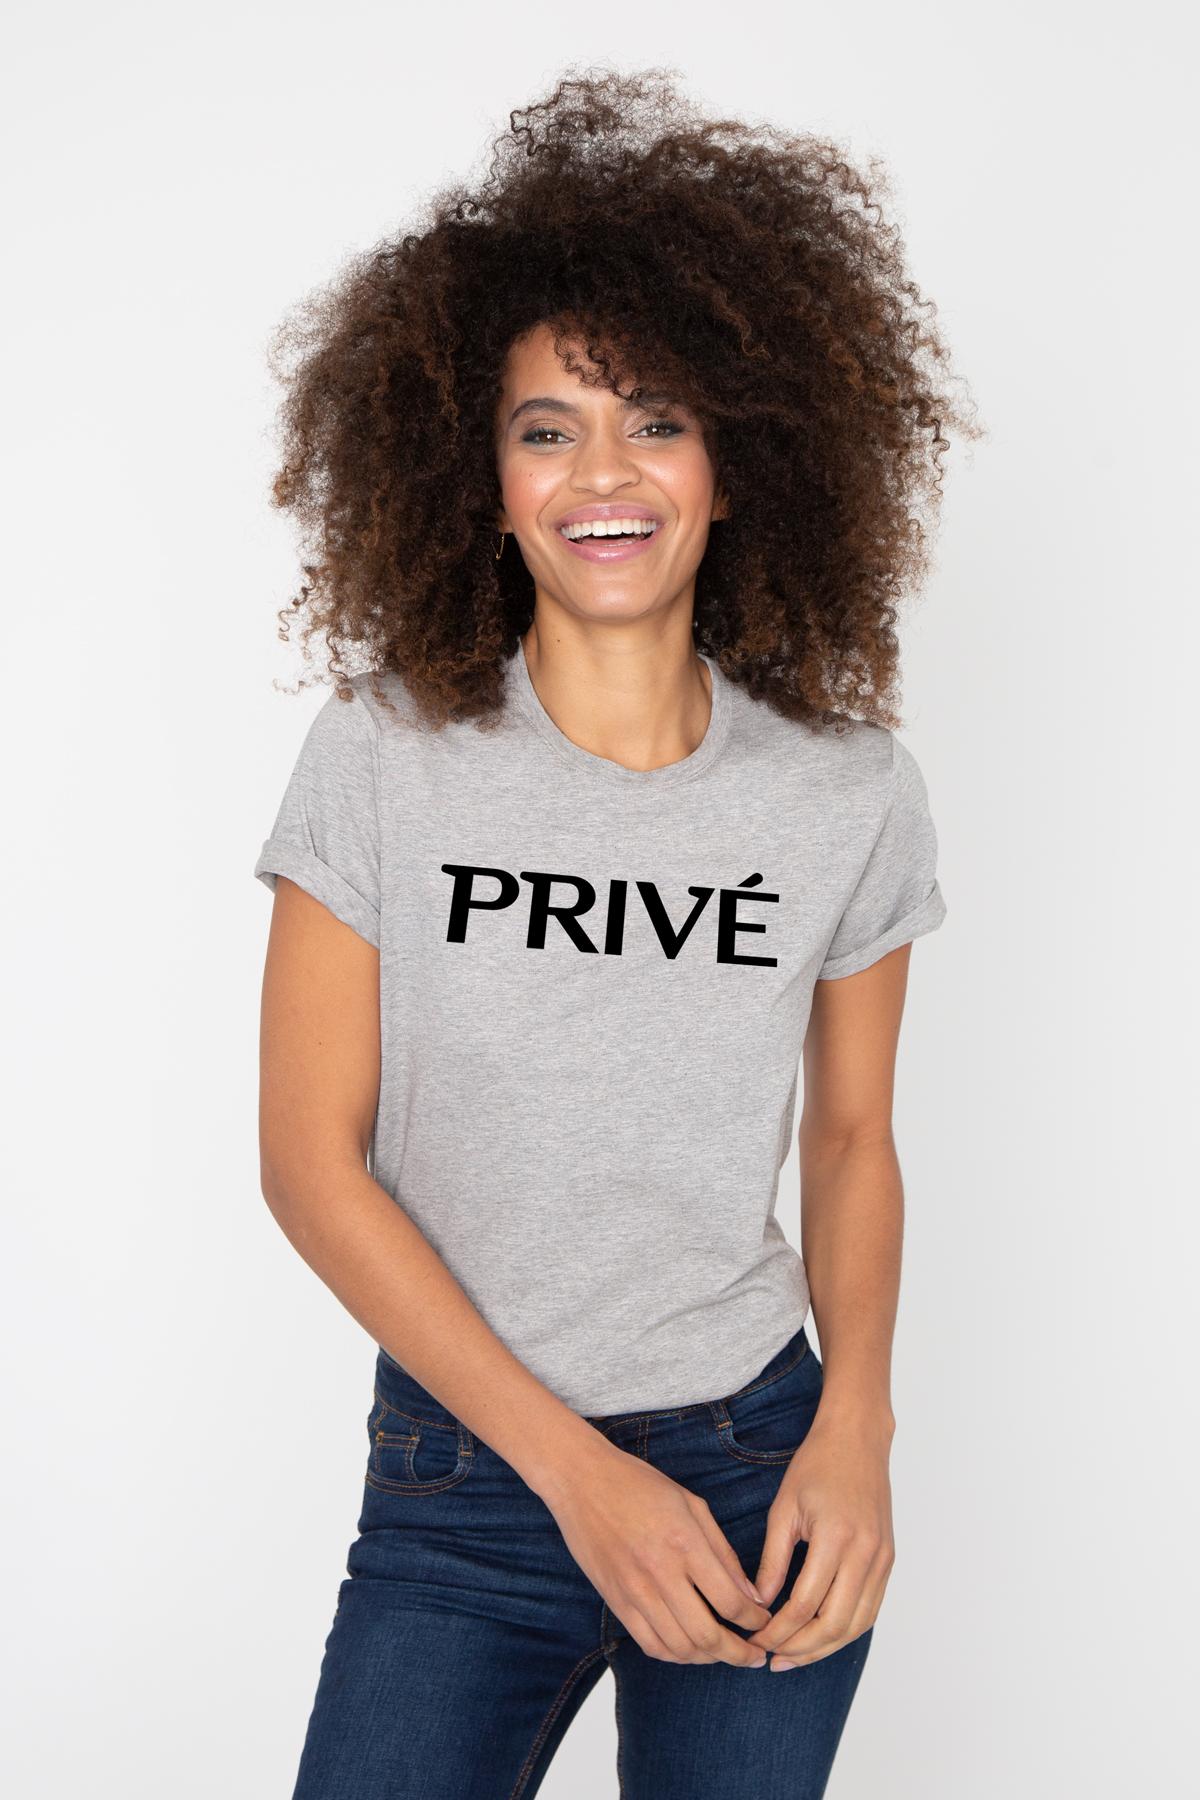 Photo de T-SHIRTS COL ROND Tshirt PRIVE chez French Disorder